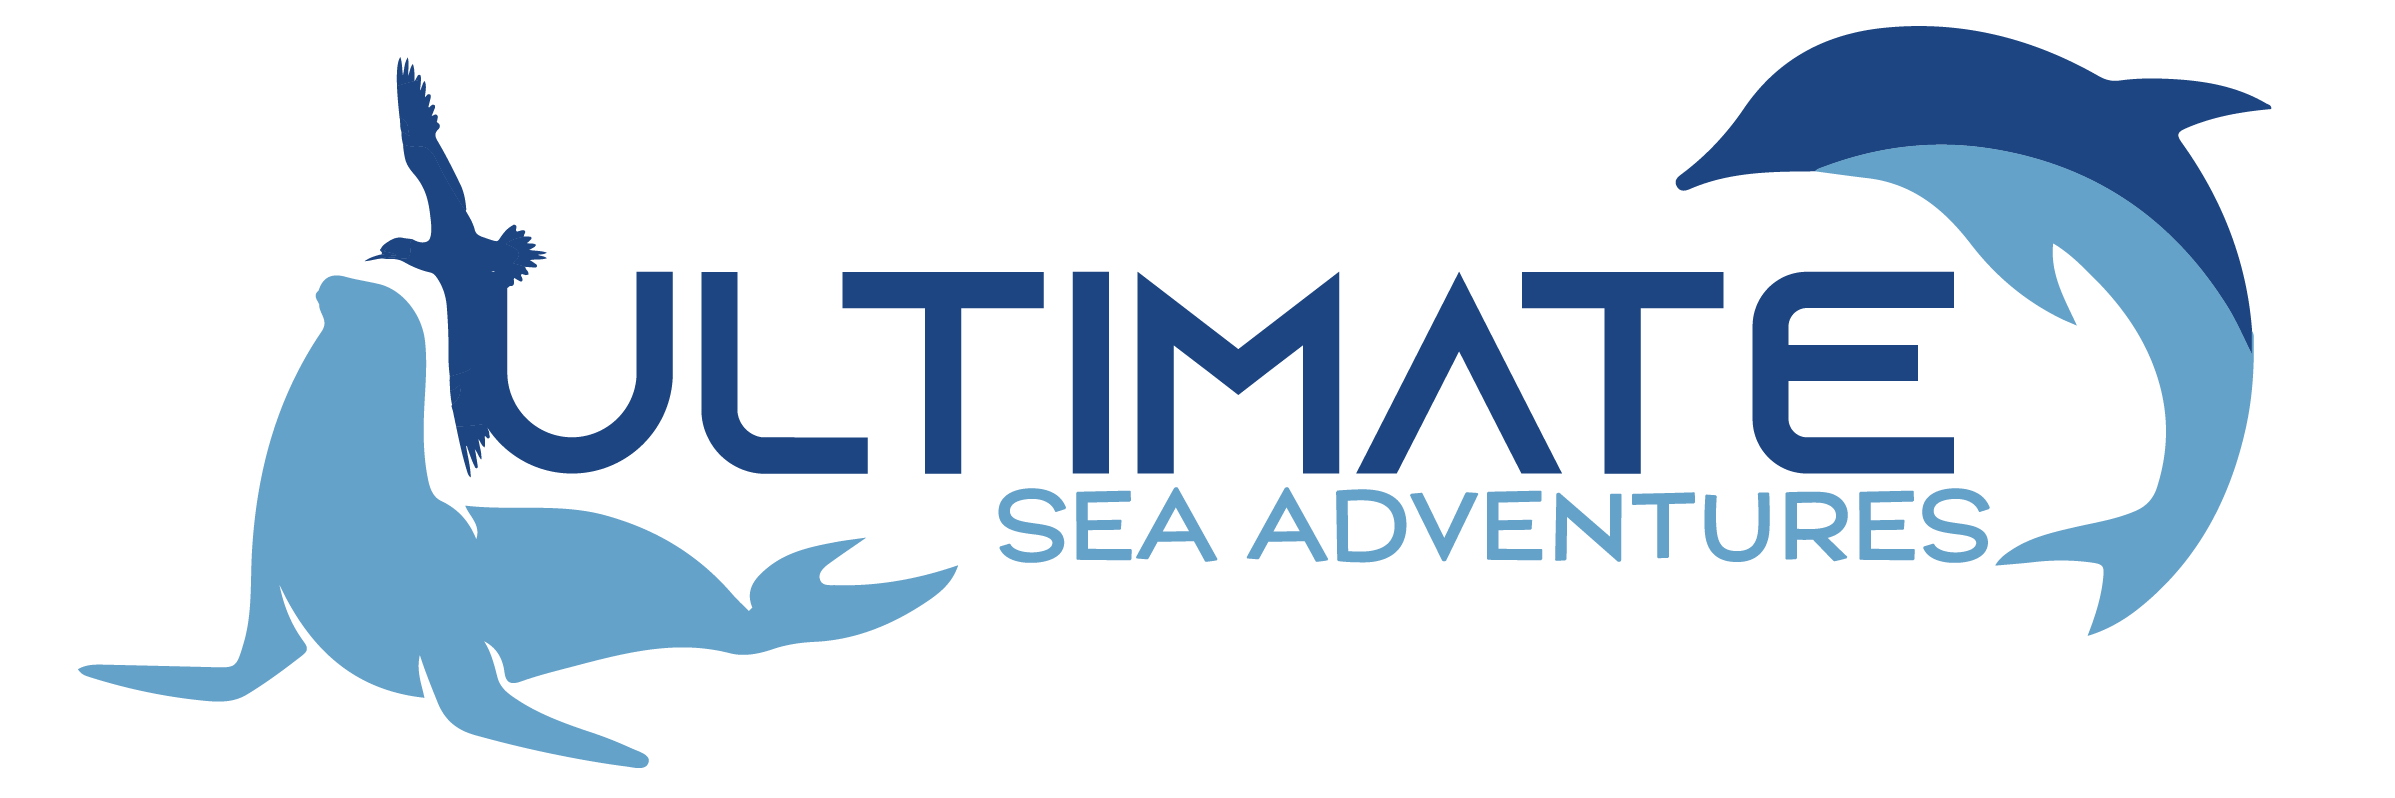 https://ultimateseaadventures.com.au/wp-content/uploads/2021/06/cropped-cropped-Ultimate-Sea-Adventures-01.png